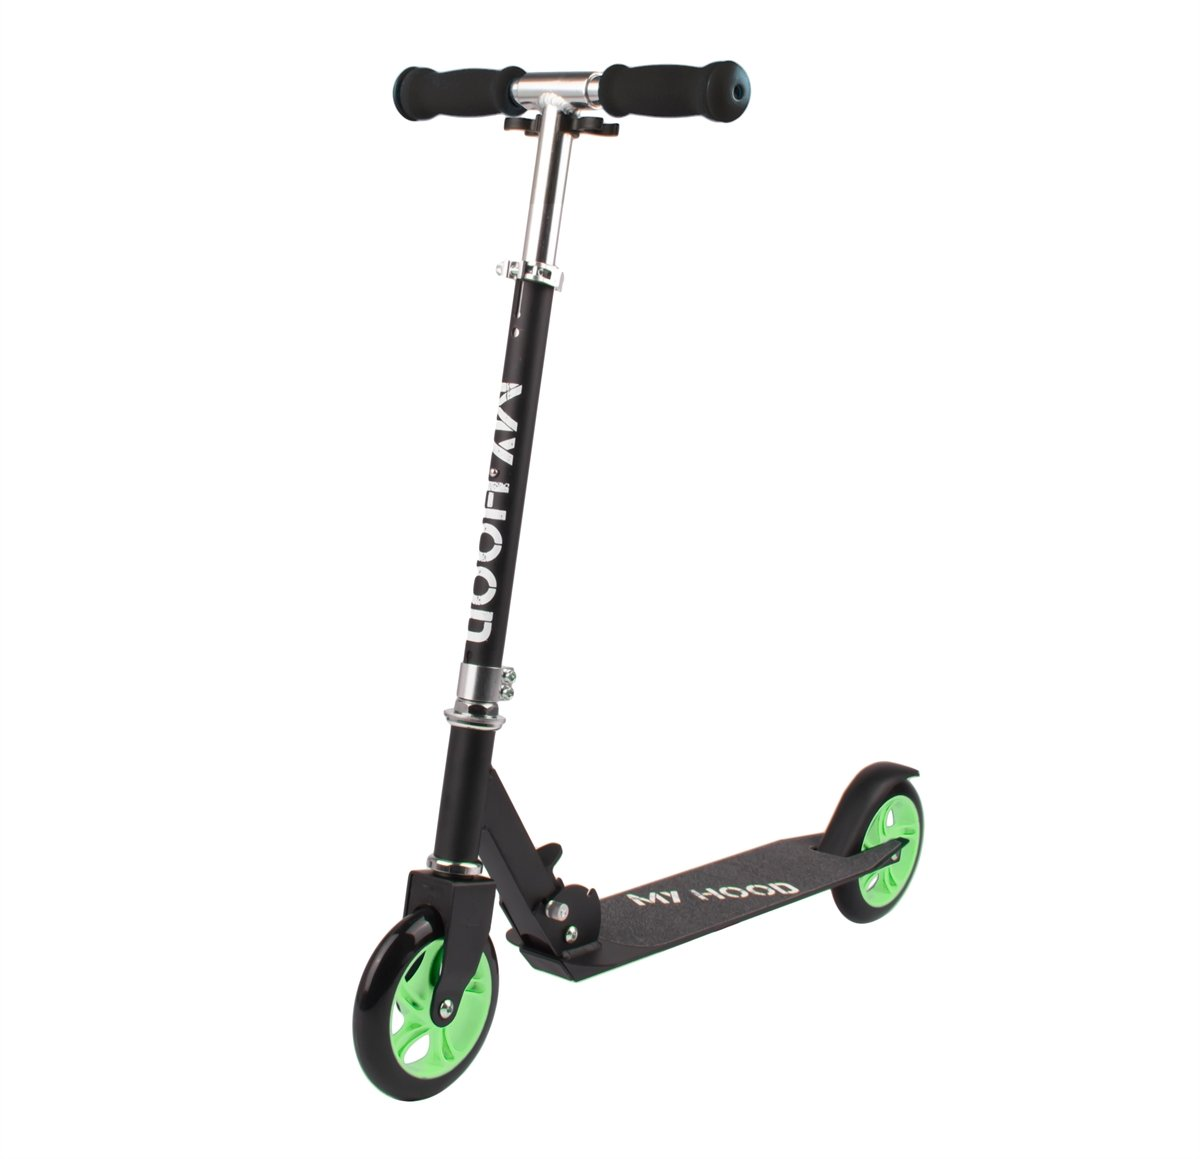 My Hood - Scooter 145 - Black/ Green (505164)